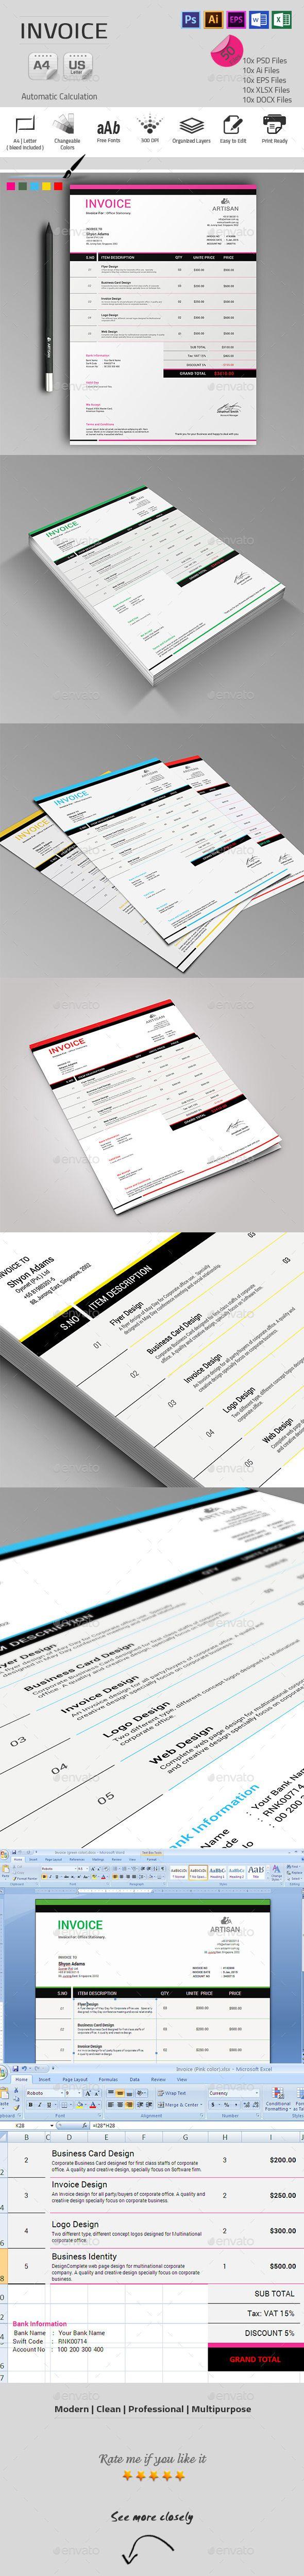 Invoice Template | Download: http://graphicriver.net/item/invoice/9900319?ref=ksioks